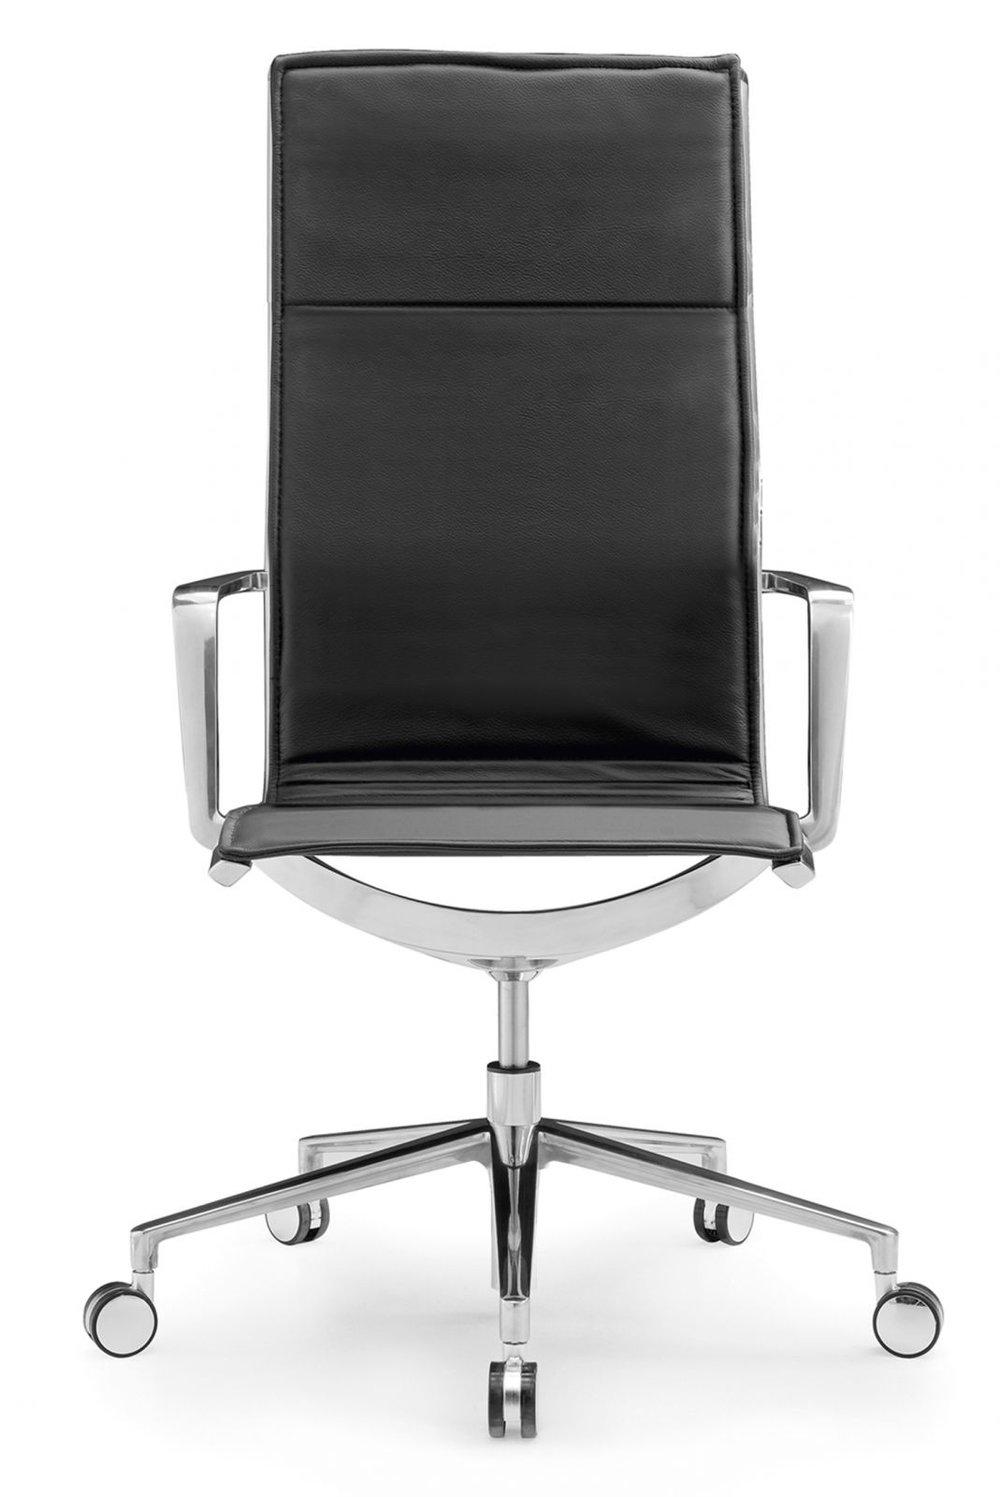 modern-office-armchairs-Italian-furniture-designer-armchairs (74).jpg